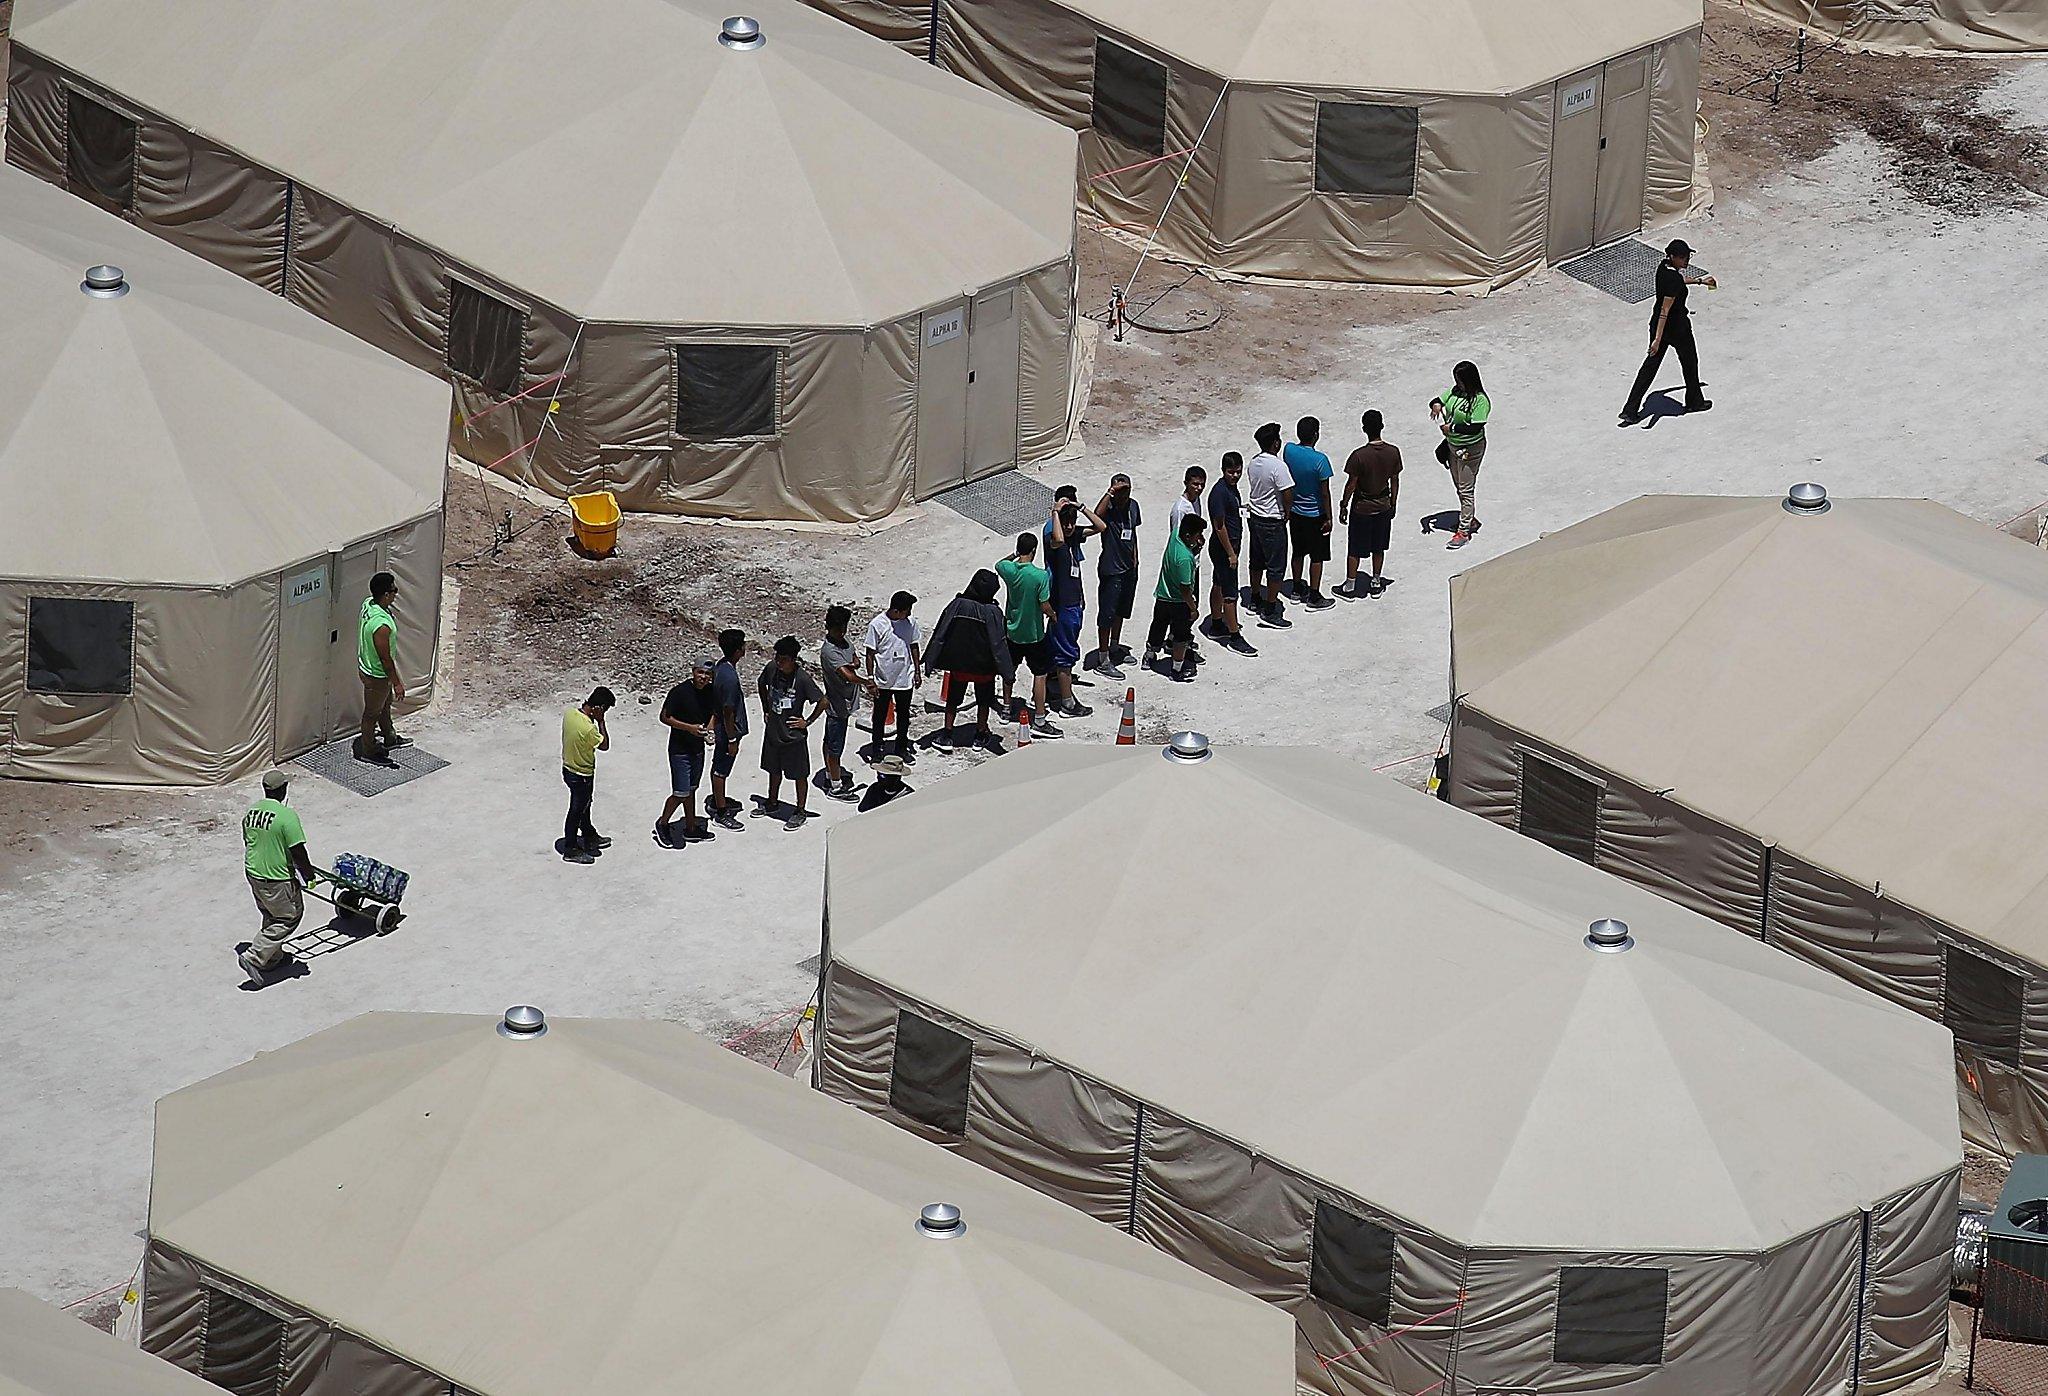 Laredo city council pushes against migrant tent facility near International Bridge